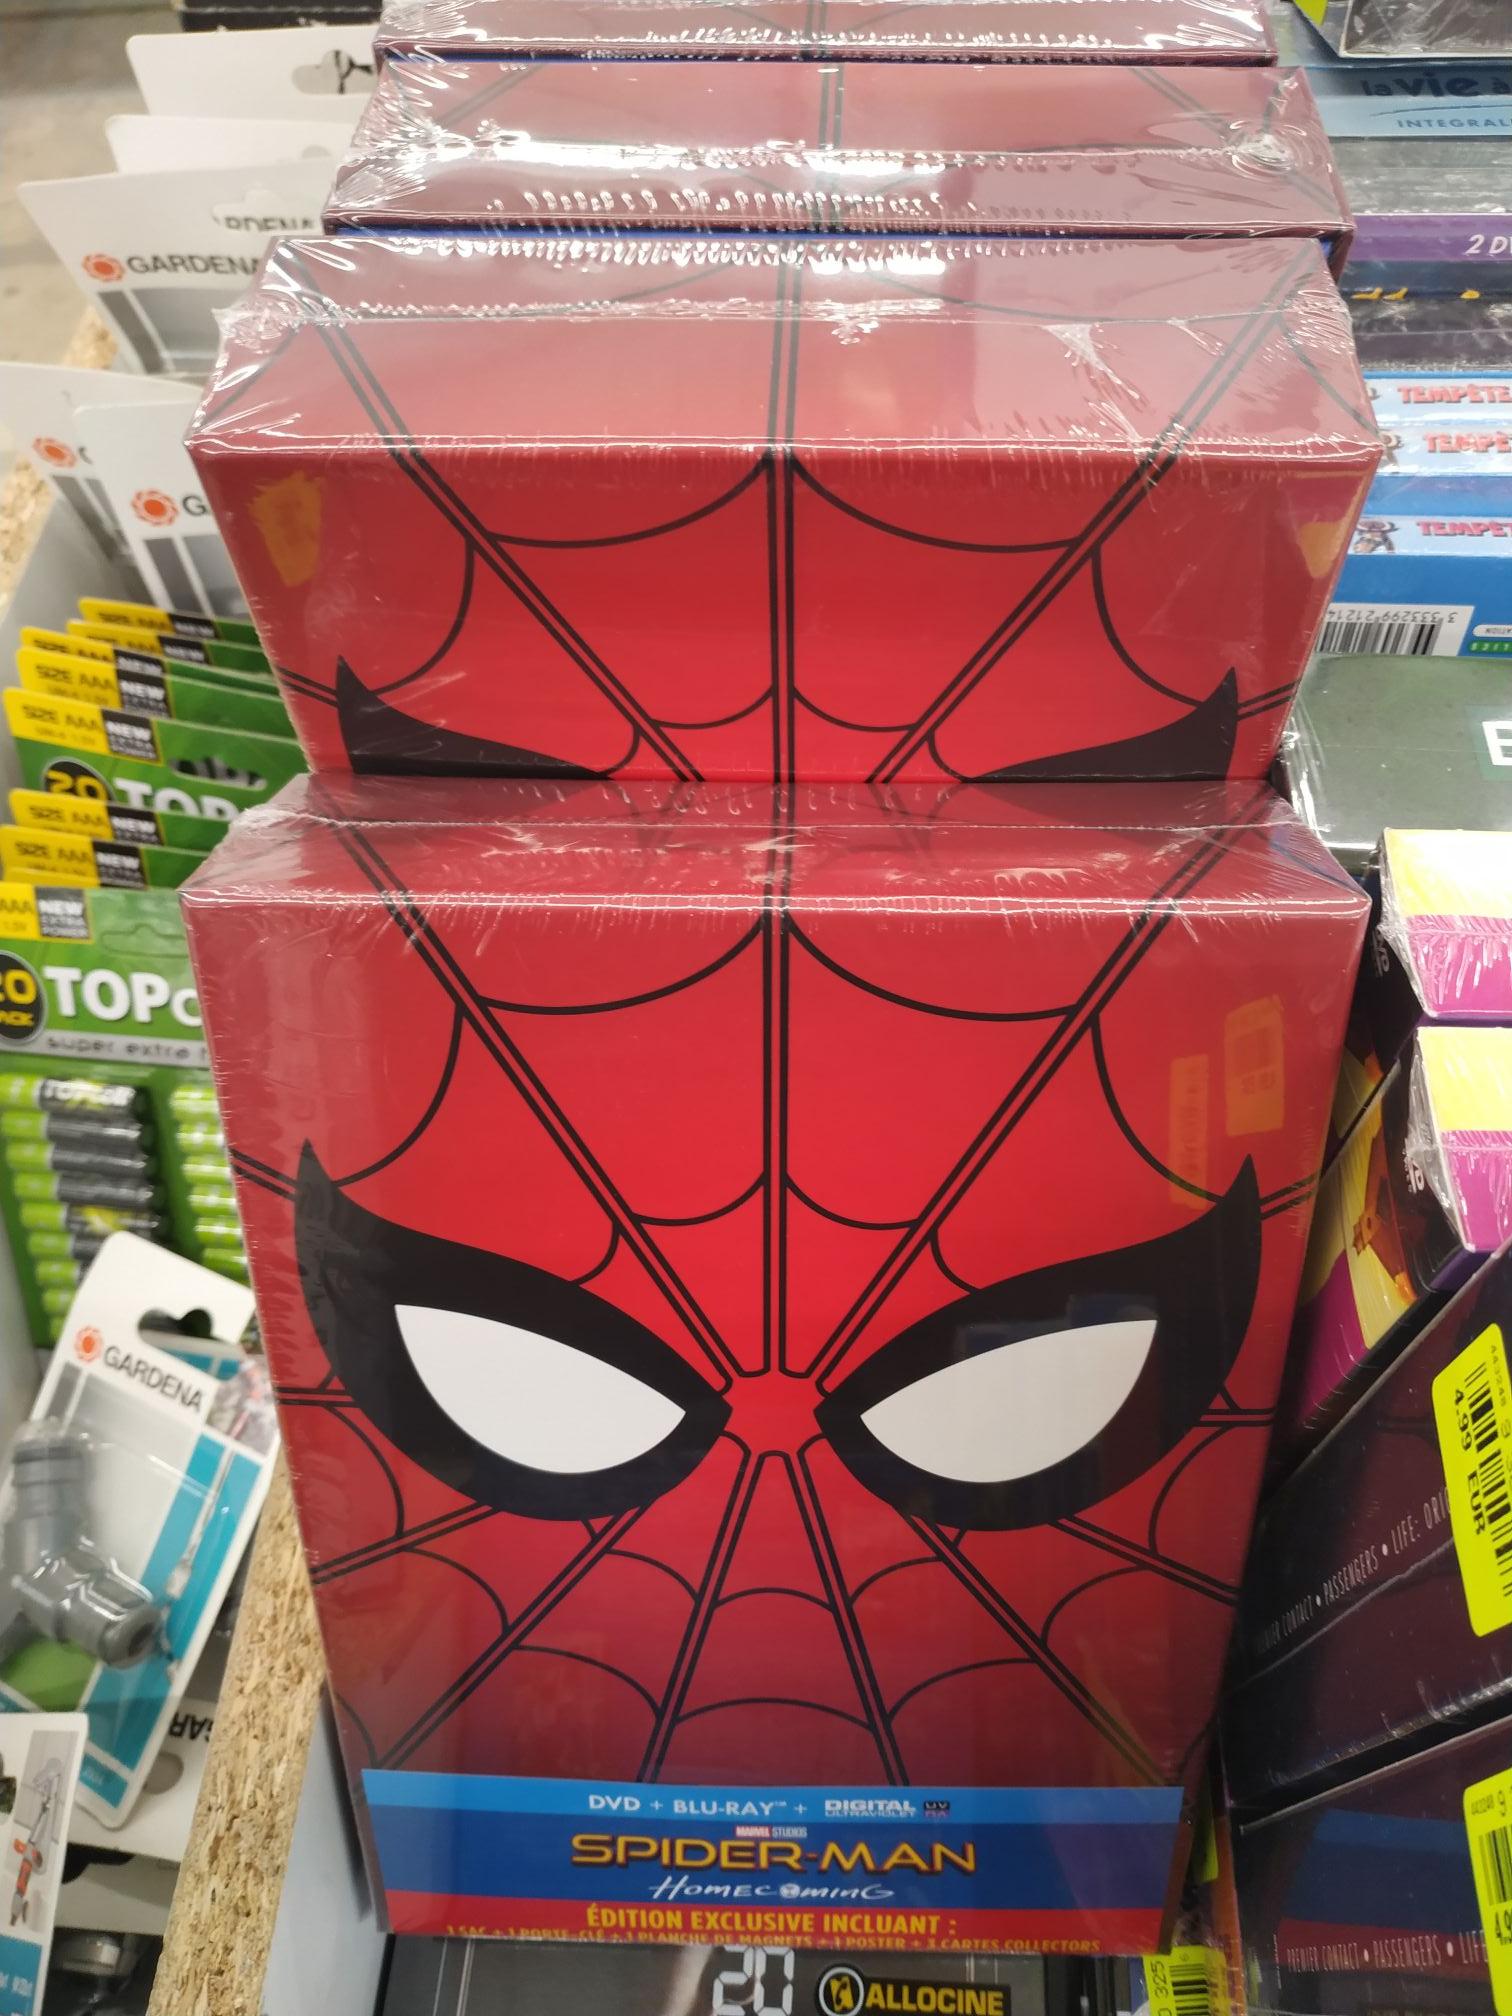 Coffret Spider-Man Homecoming (DVD + Blu-ray + digital ultraviolet) - Chasseneuil du Poitou (86) / Menneval (27) / Bourgoin (38)